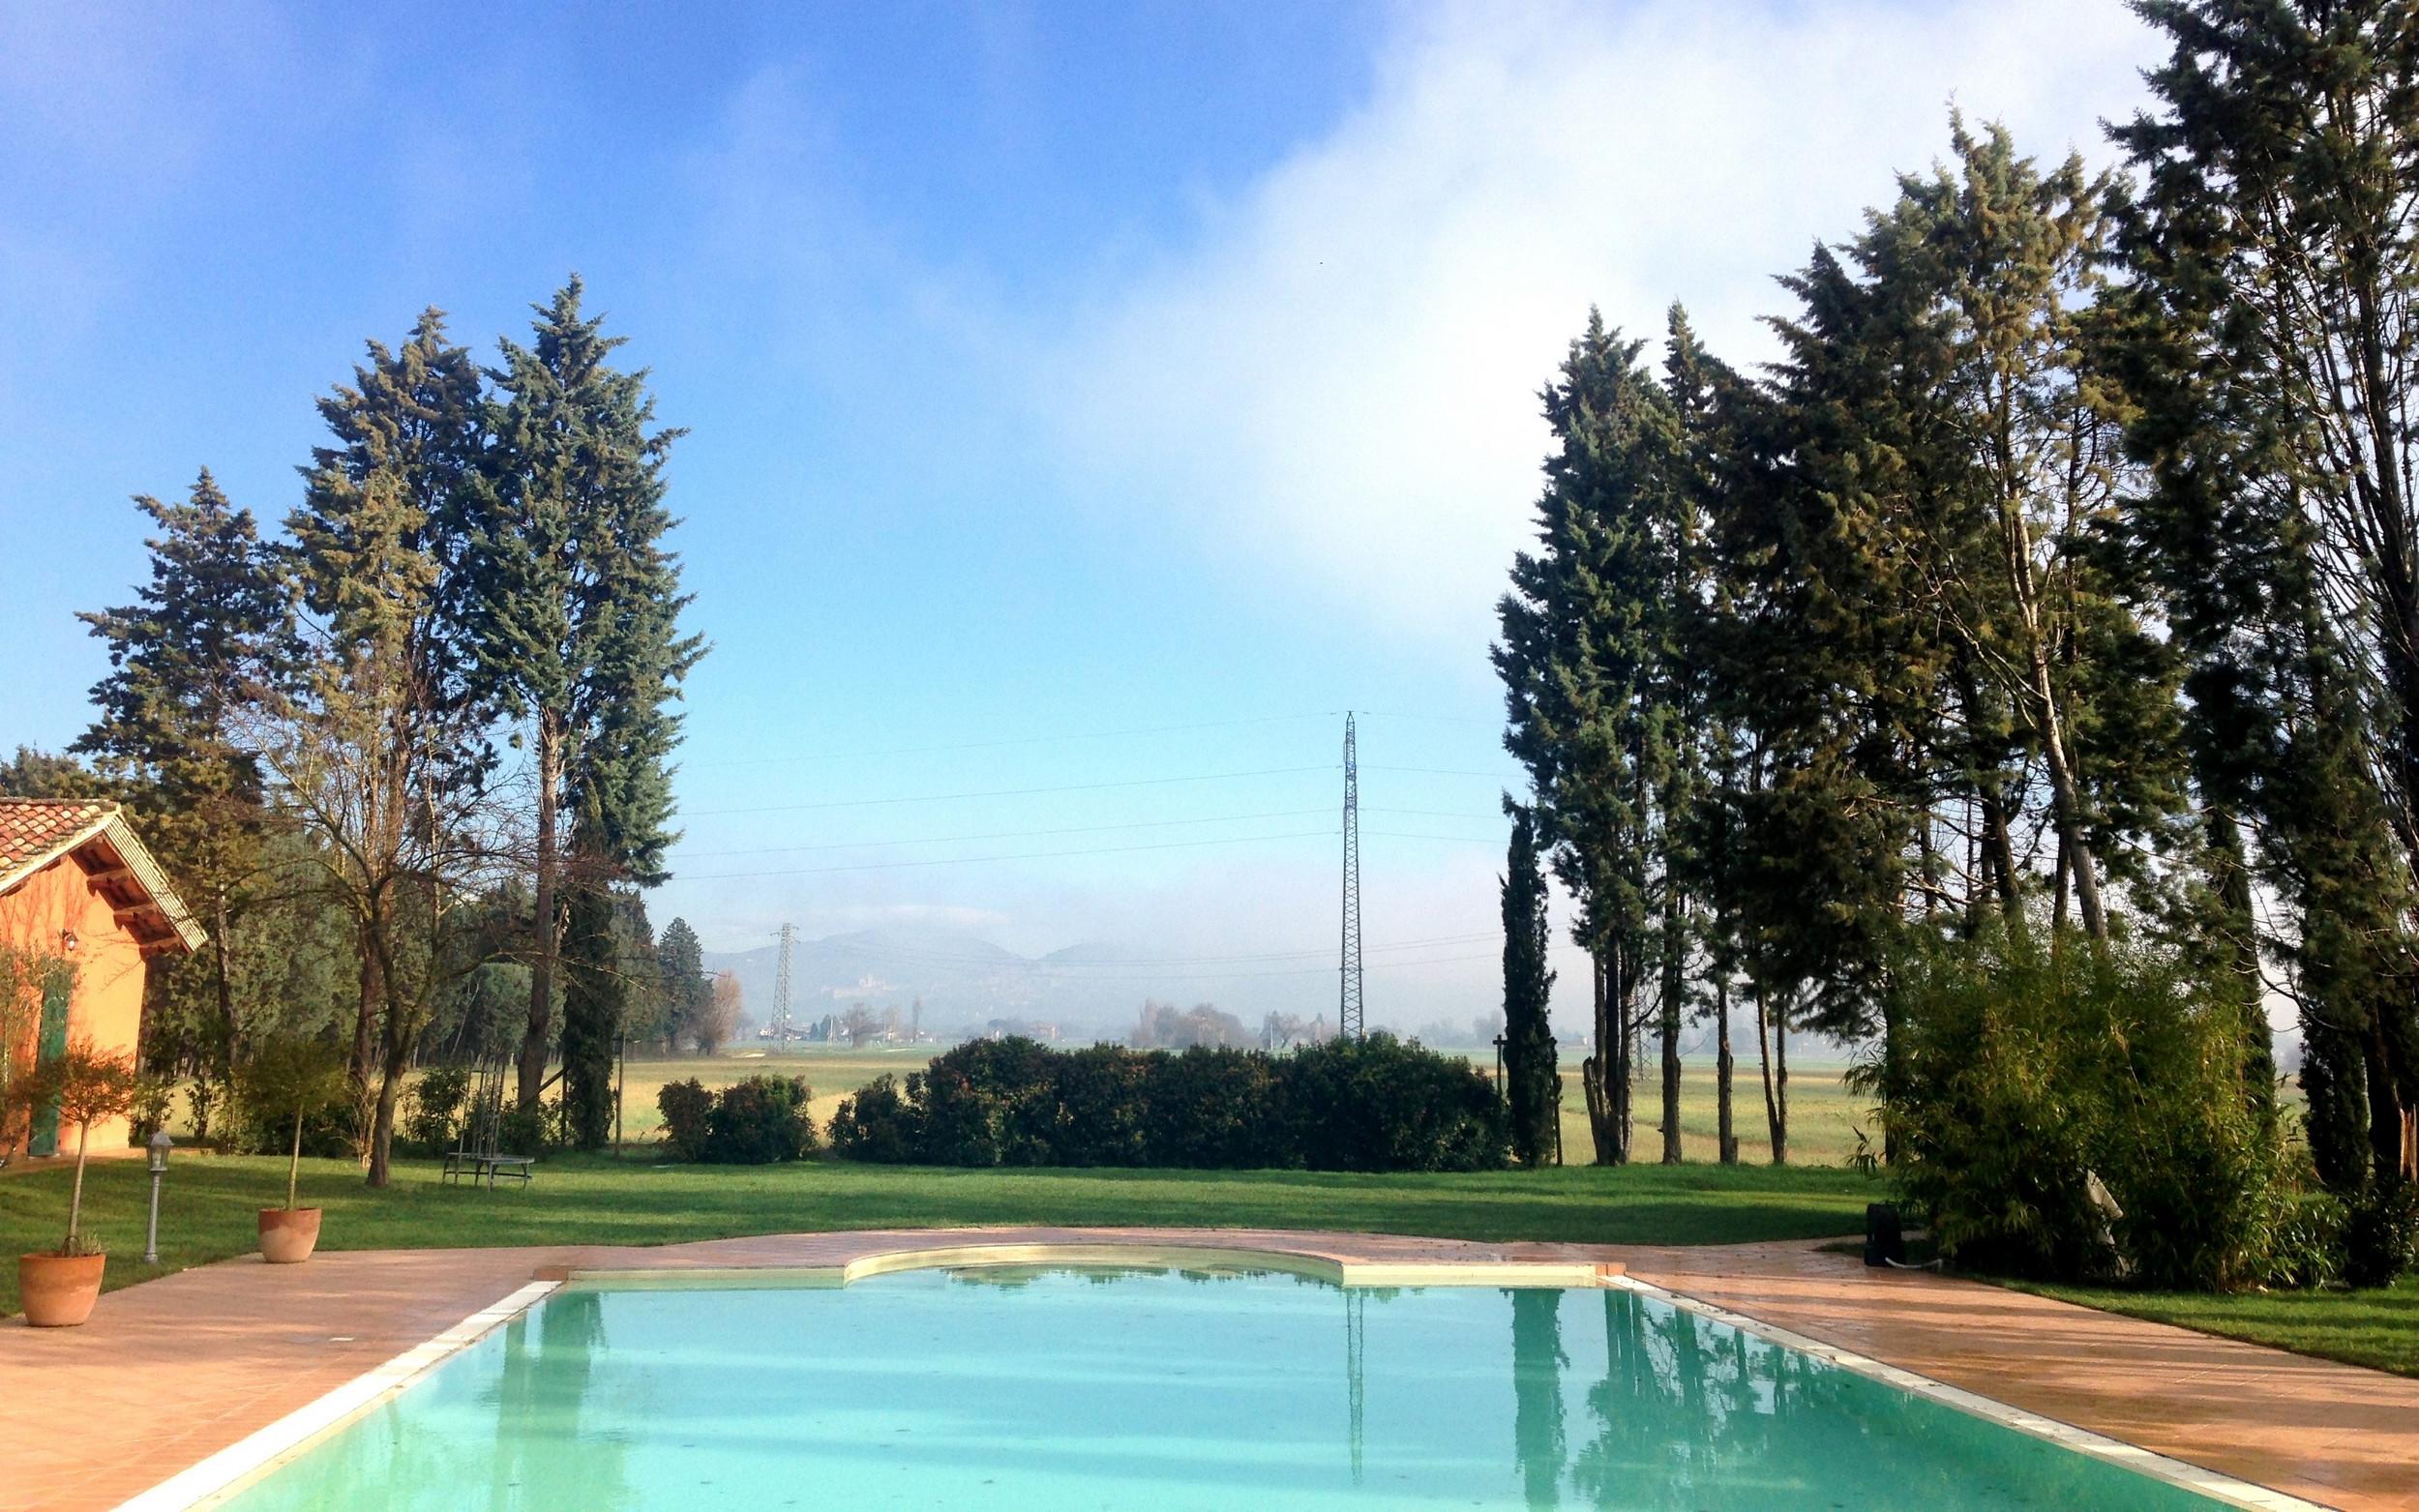 Hotel Garden Resort & Spa San Crispino